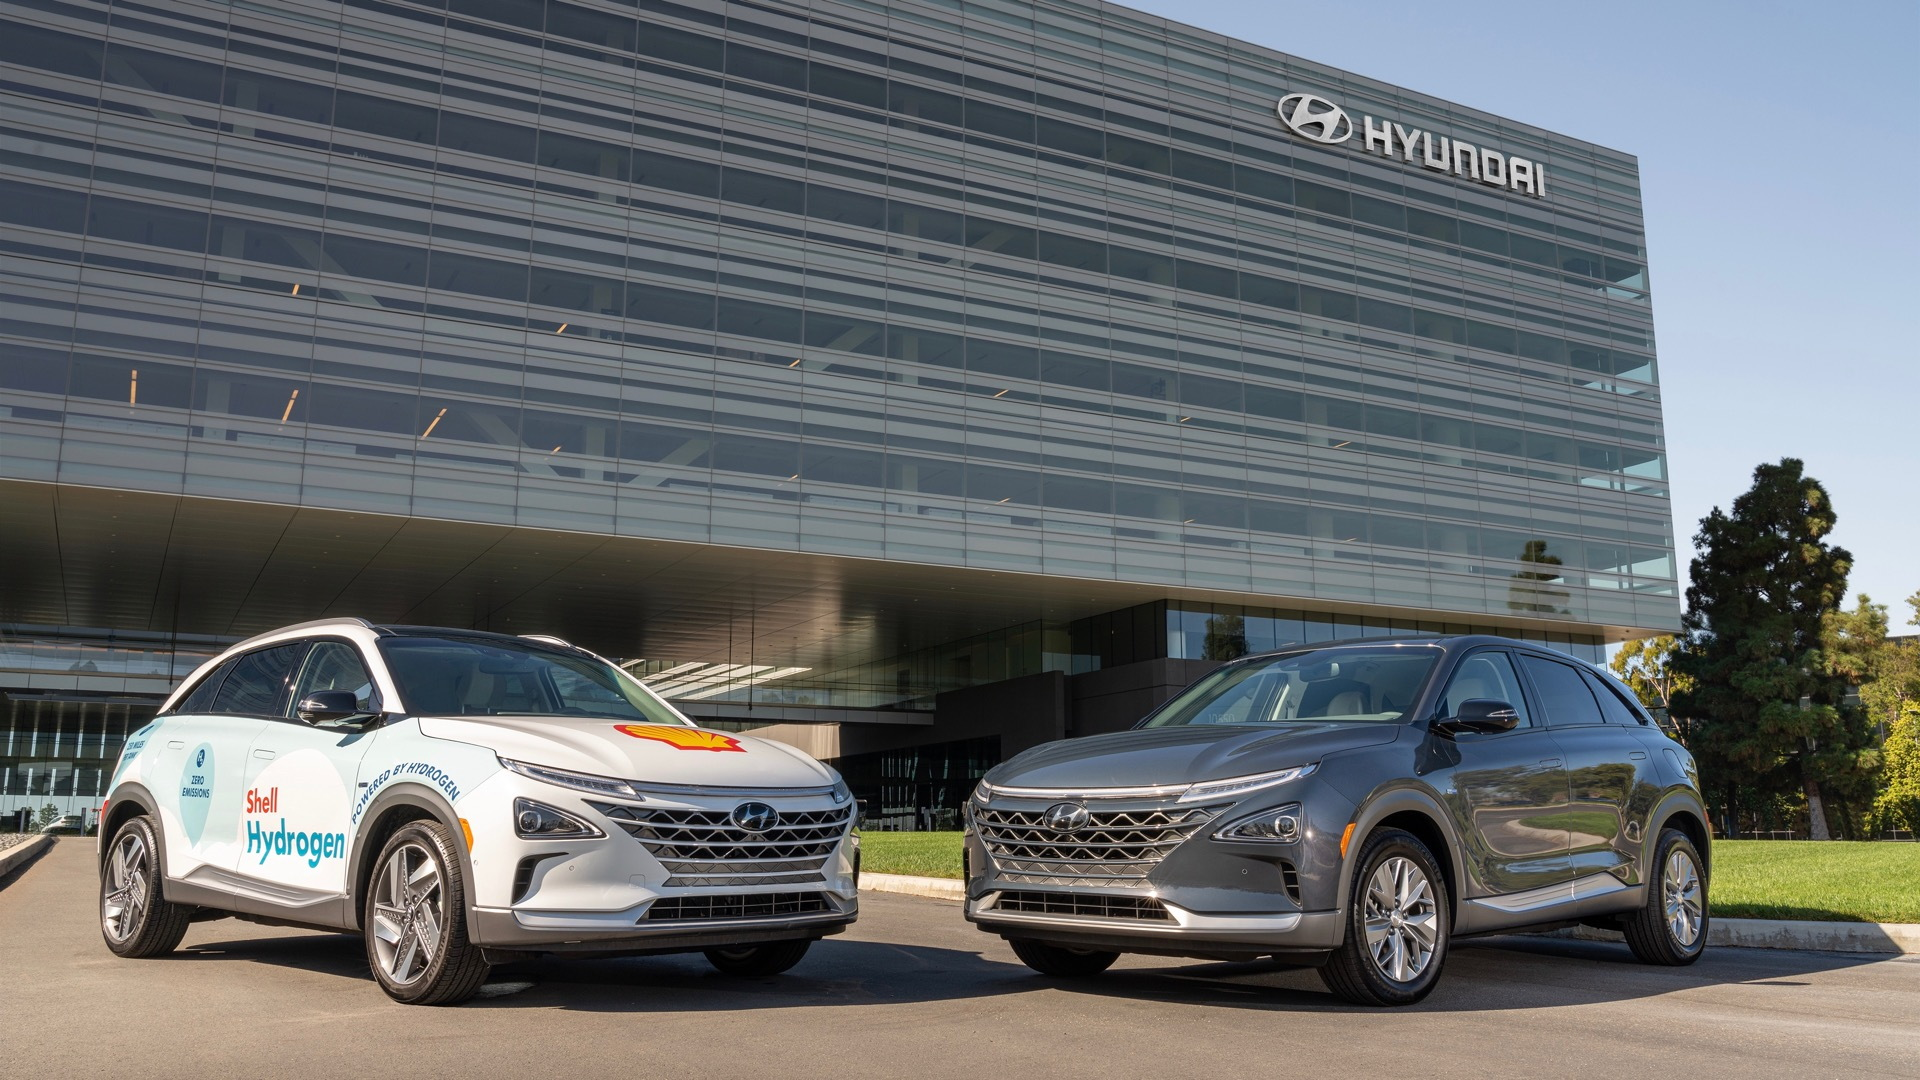 Hyundai Nexo crossovers promoting Shell hydrogen-infrastructure partnership